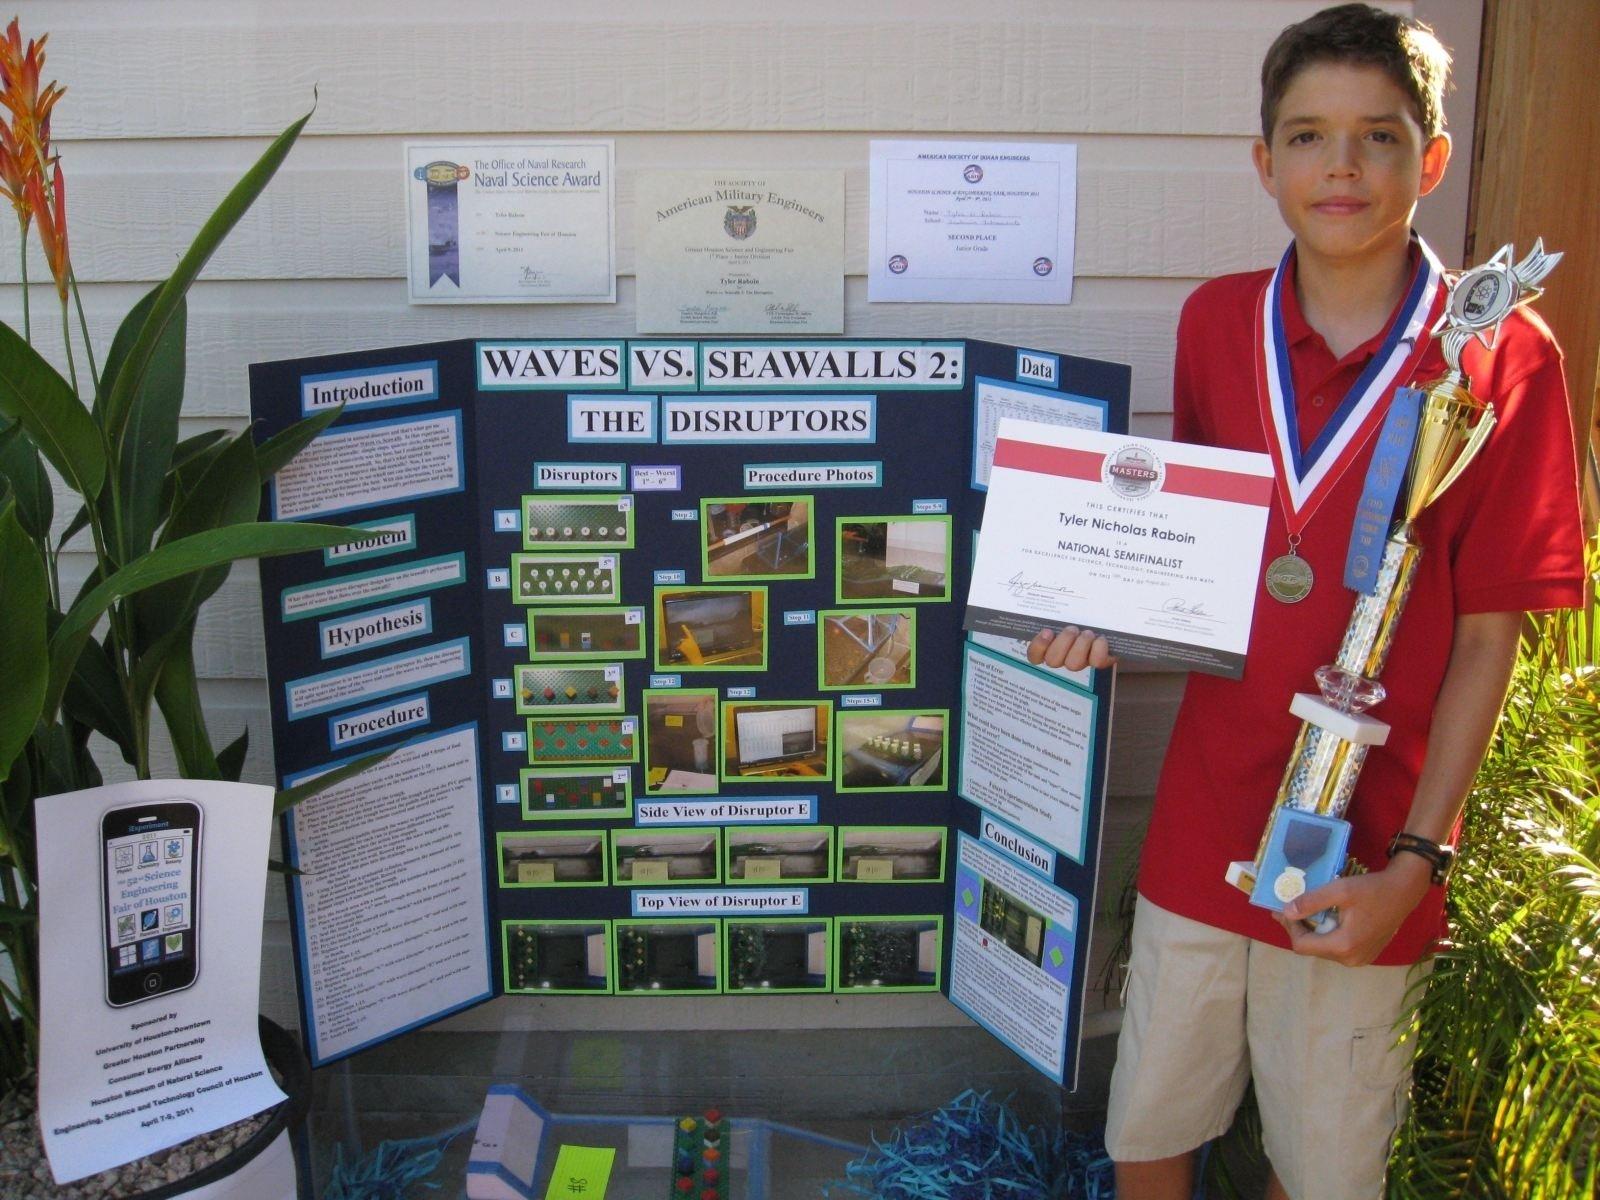 10 Cute 11Th Grade Science Fair Project Ideas science fair projects for 8th graders essay service yeassignmentidqn 25 2020